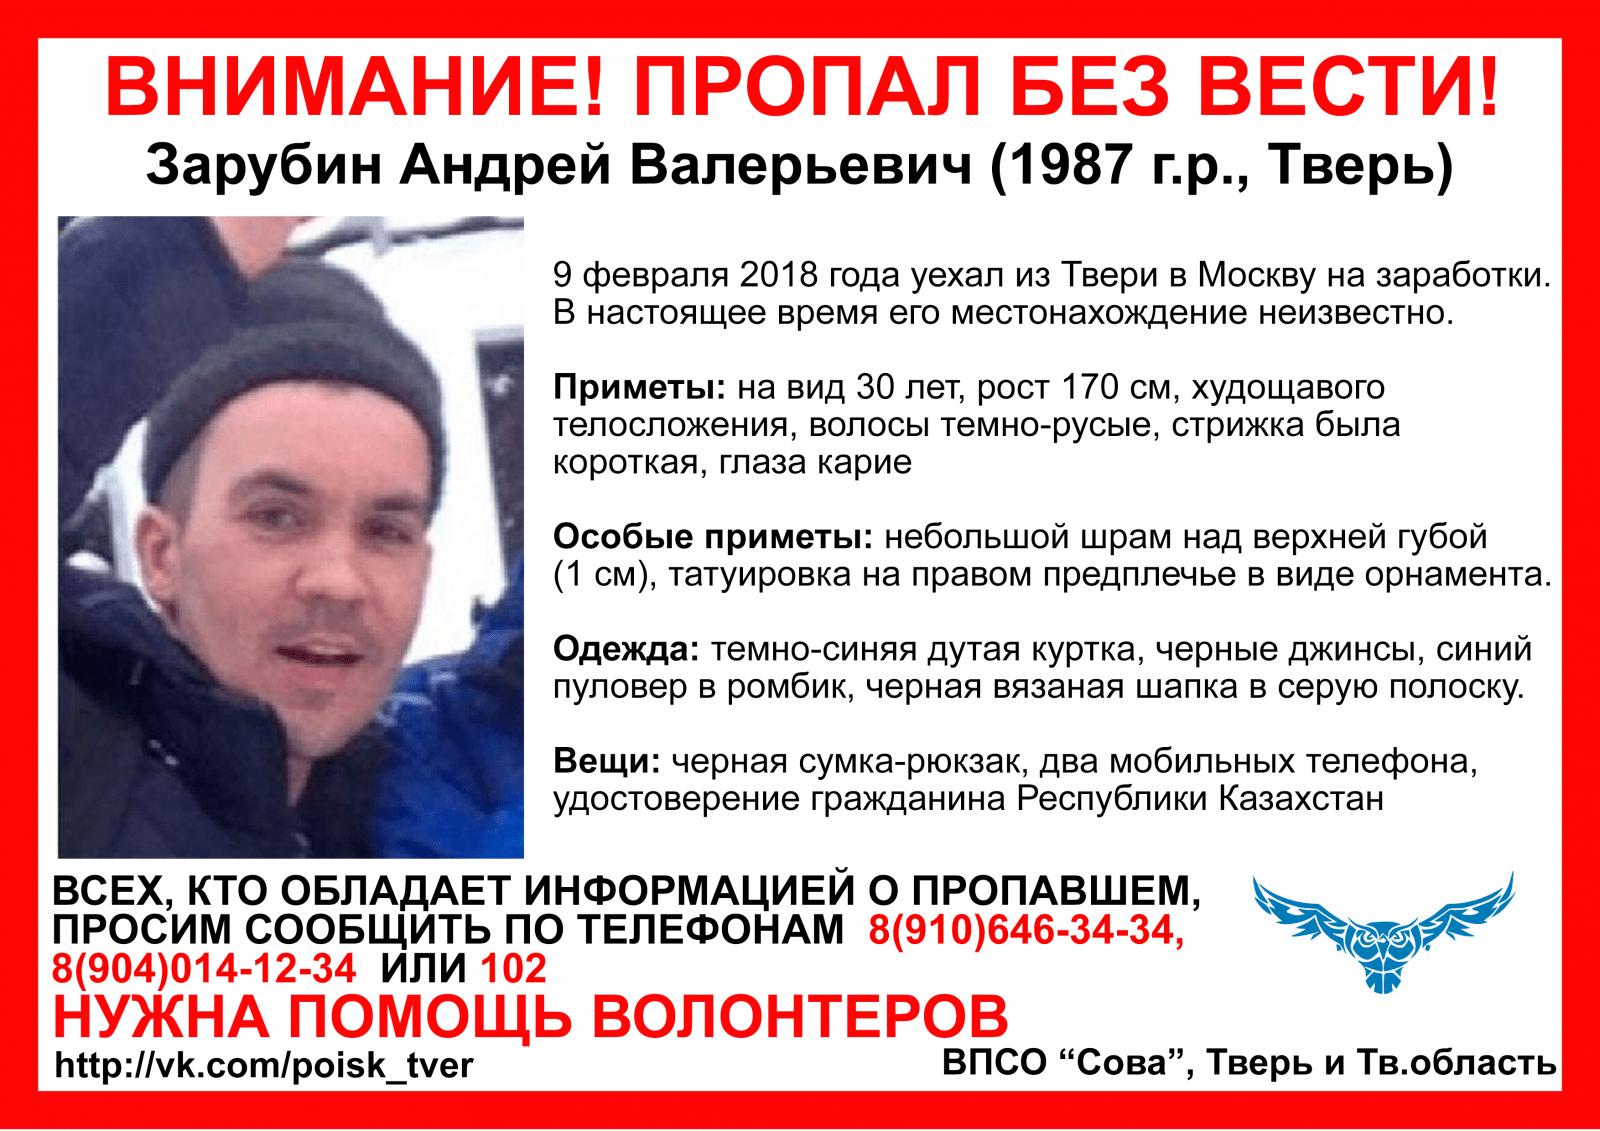 Пропал Зарубин Андрей Валерьевич (1987 г.р.)